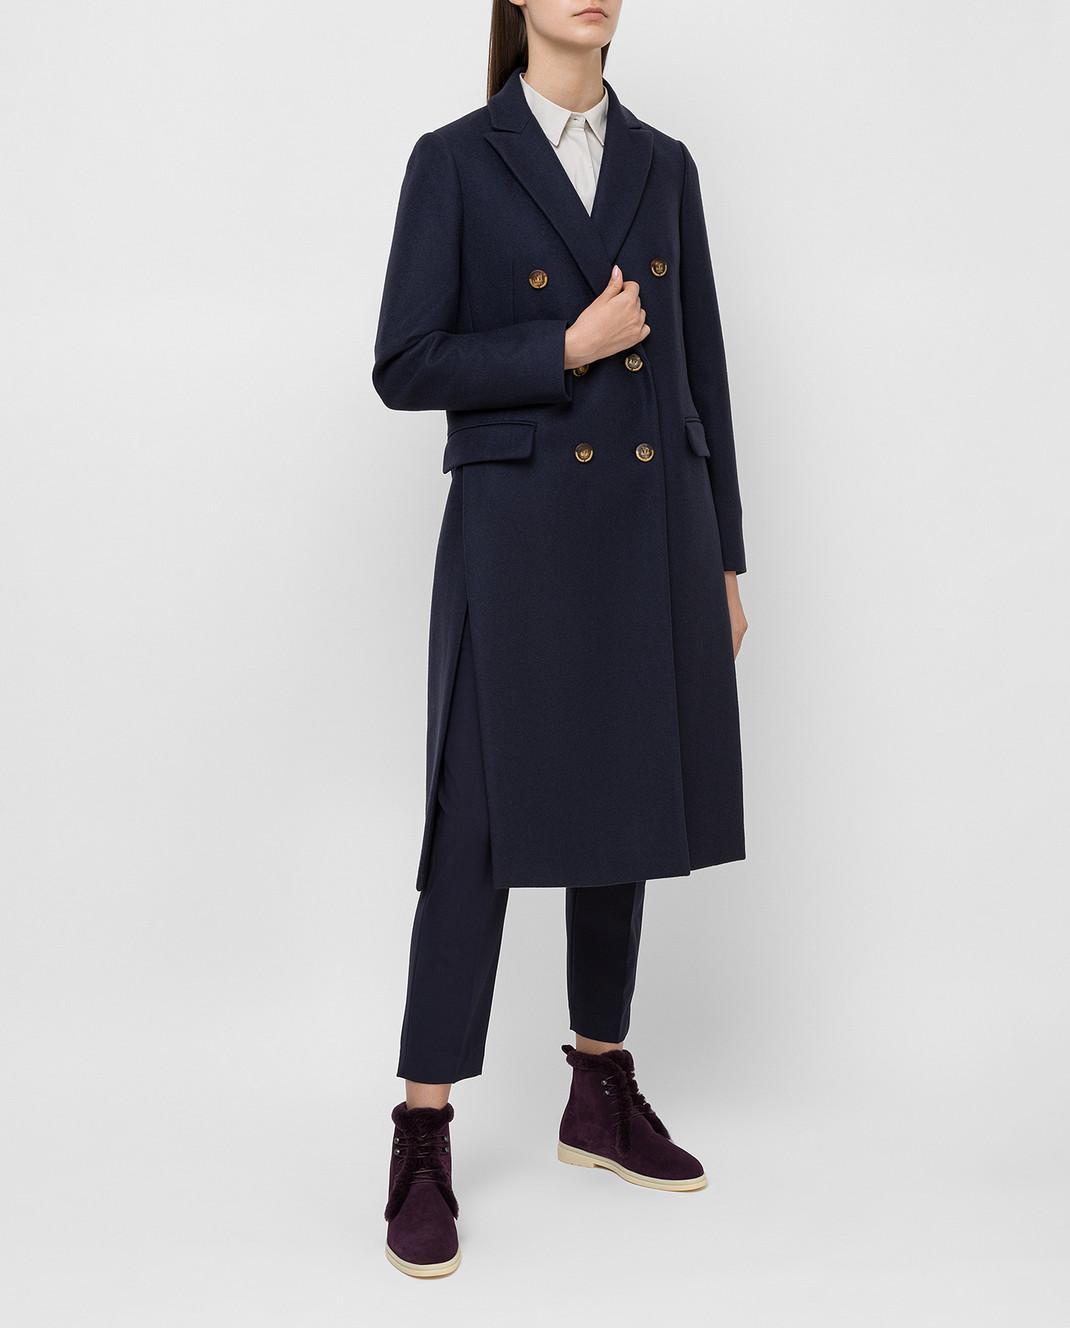 Brunello Cucinelli Темно-синее пальто из кашемира MA5324963 изображение 2